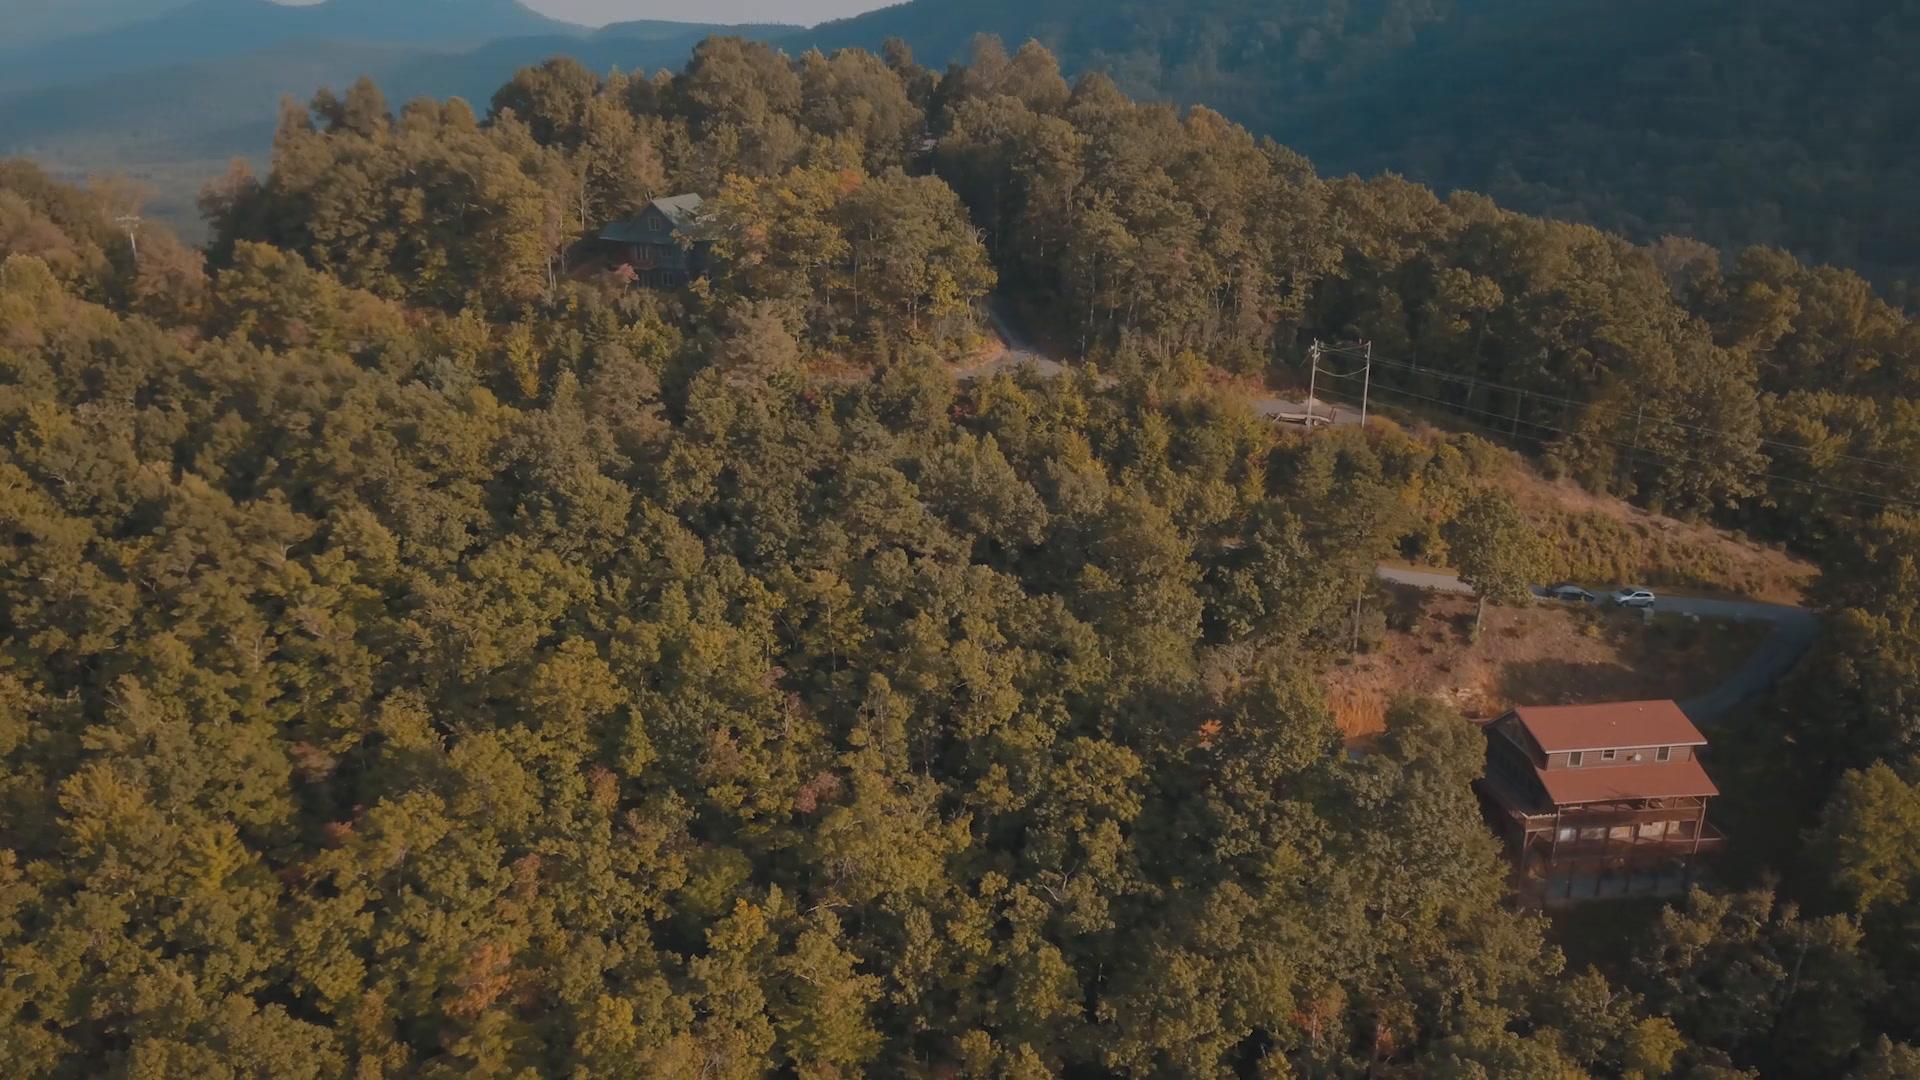 Christine + Jeffrey | Black Mountain, North Carolina | Bama Bear Lodge